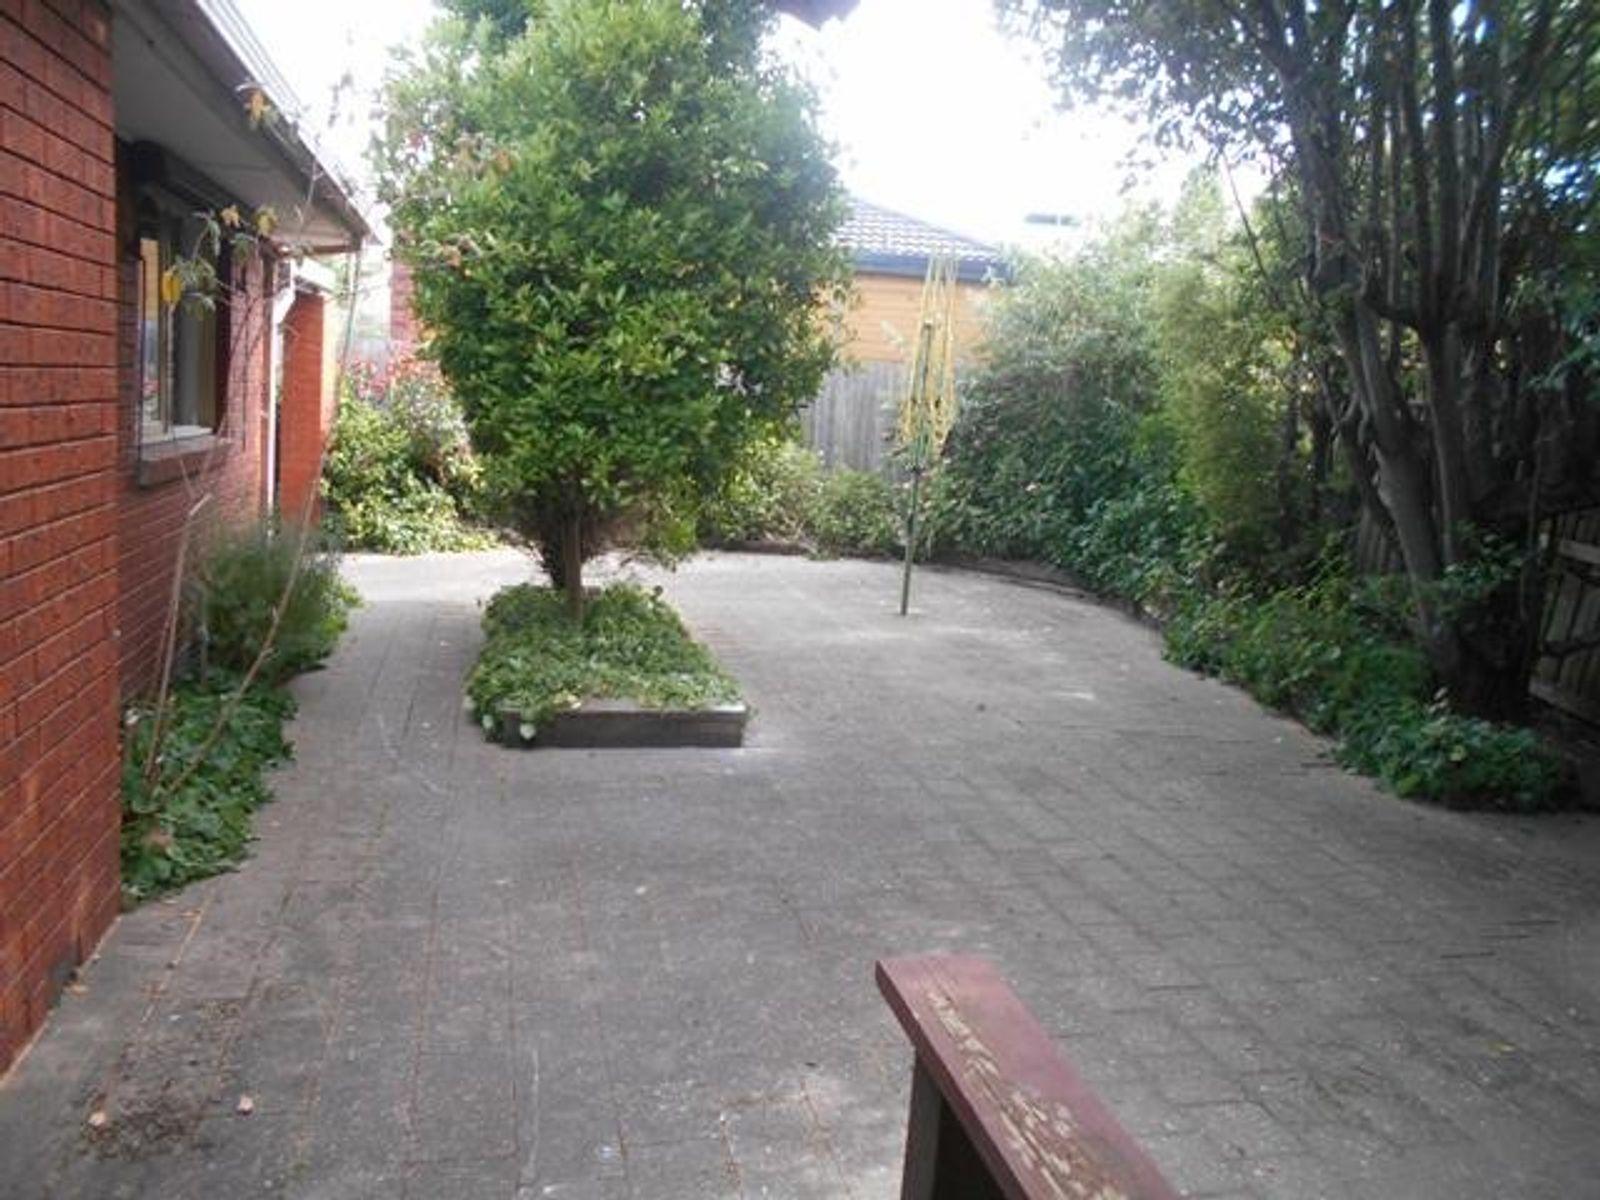 6 Sandhurst Road, Wantirna, VIC 3152